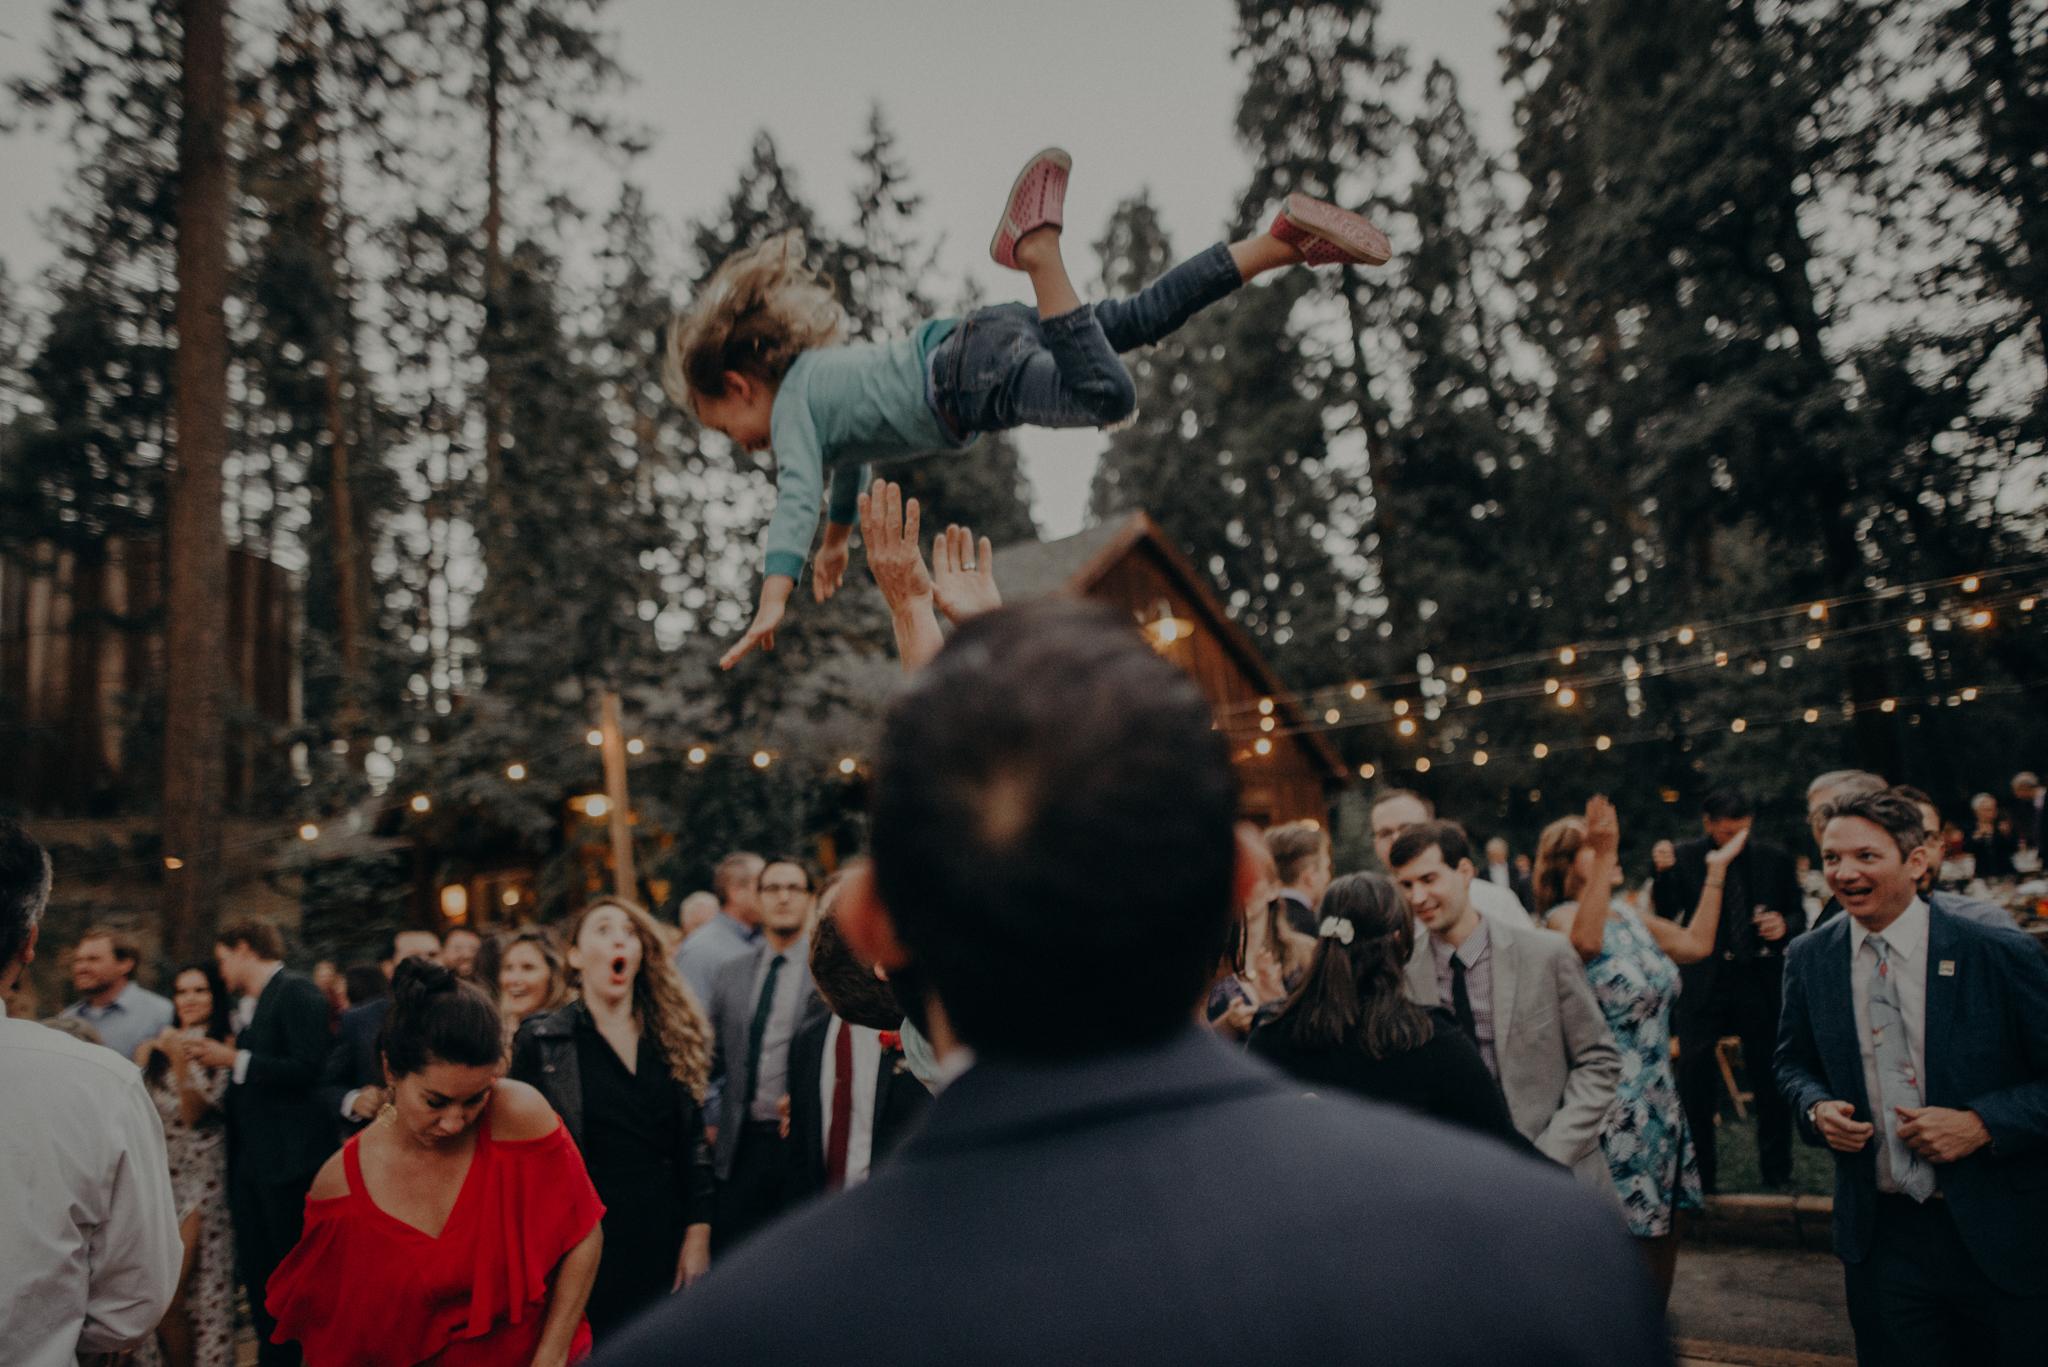 Yosemite Elopement Photographer - Evergreen Lodge Wedding Photographer - IsaiahAndTaylor.com-139.jpg